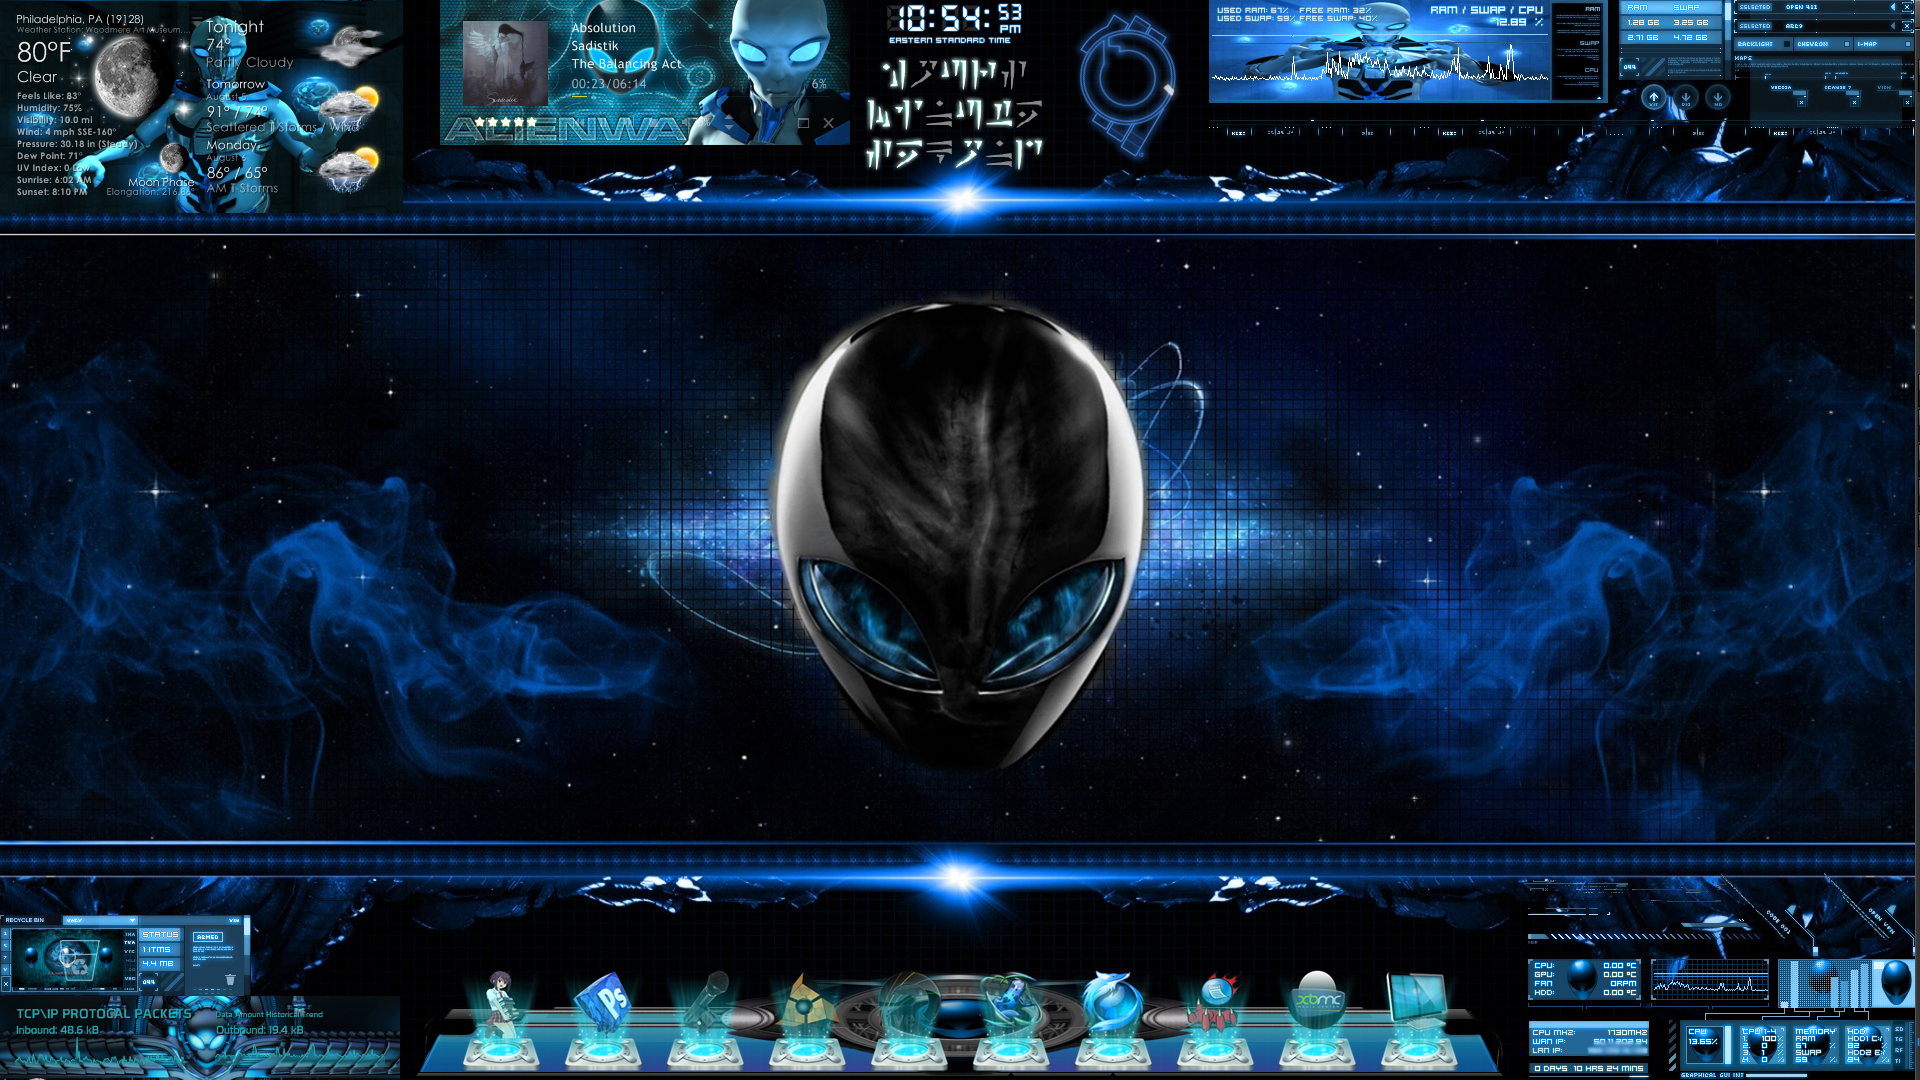 Windows 7 alienware theme.